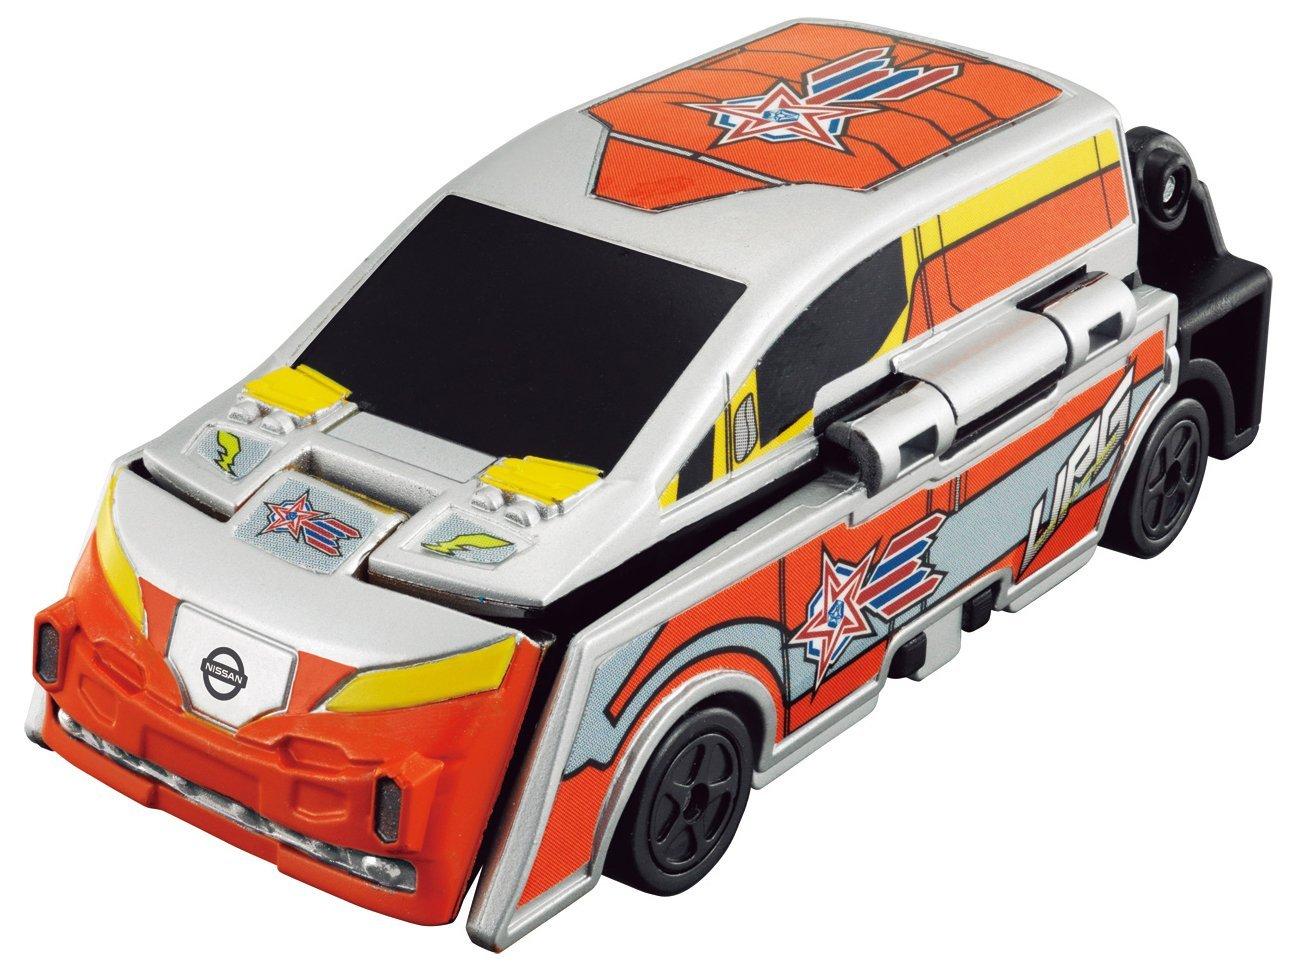 X射線~C892706~鹹蛋超人變身汽車玩具車 ,玩具車  迴力車  模型  玩具